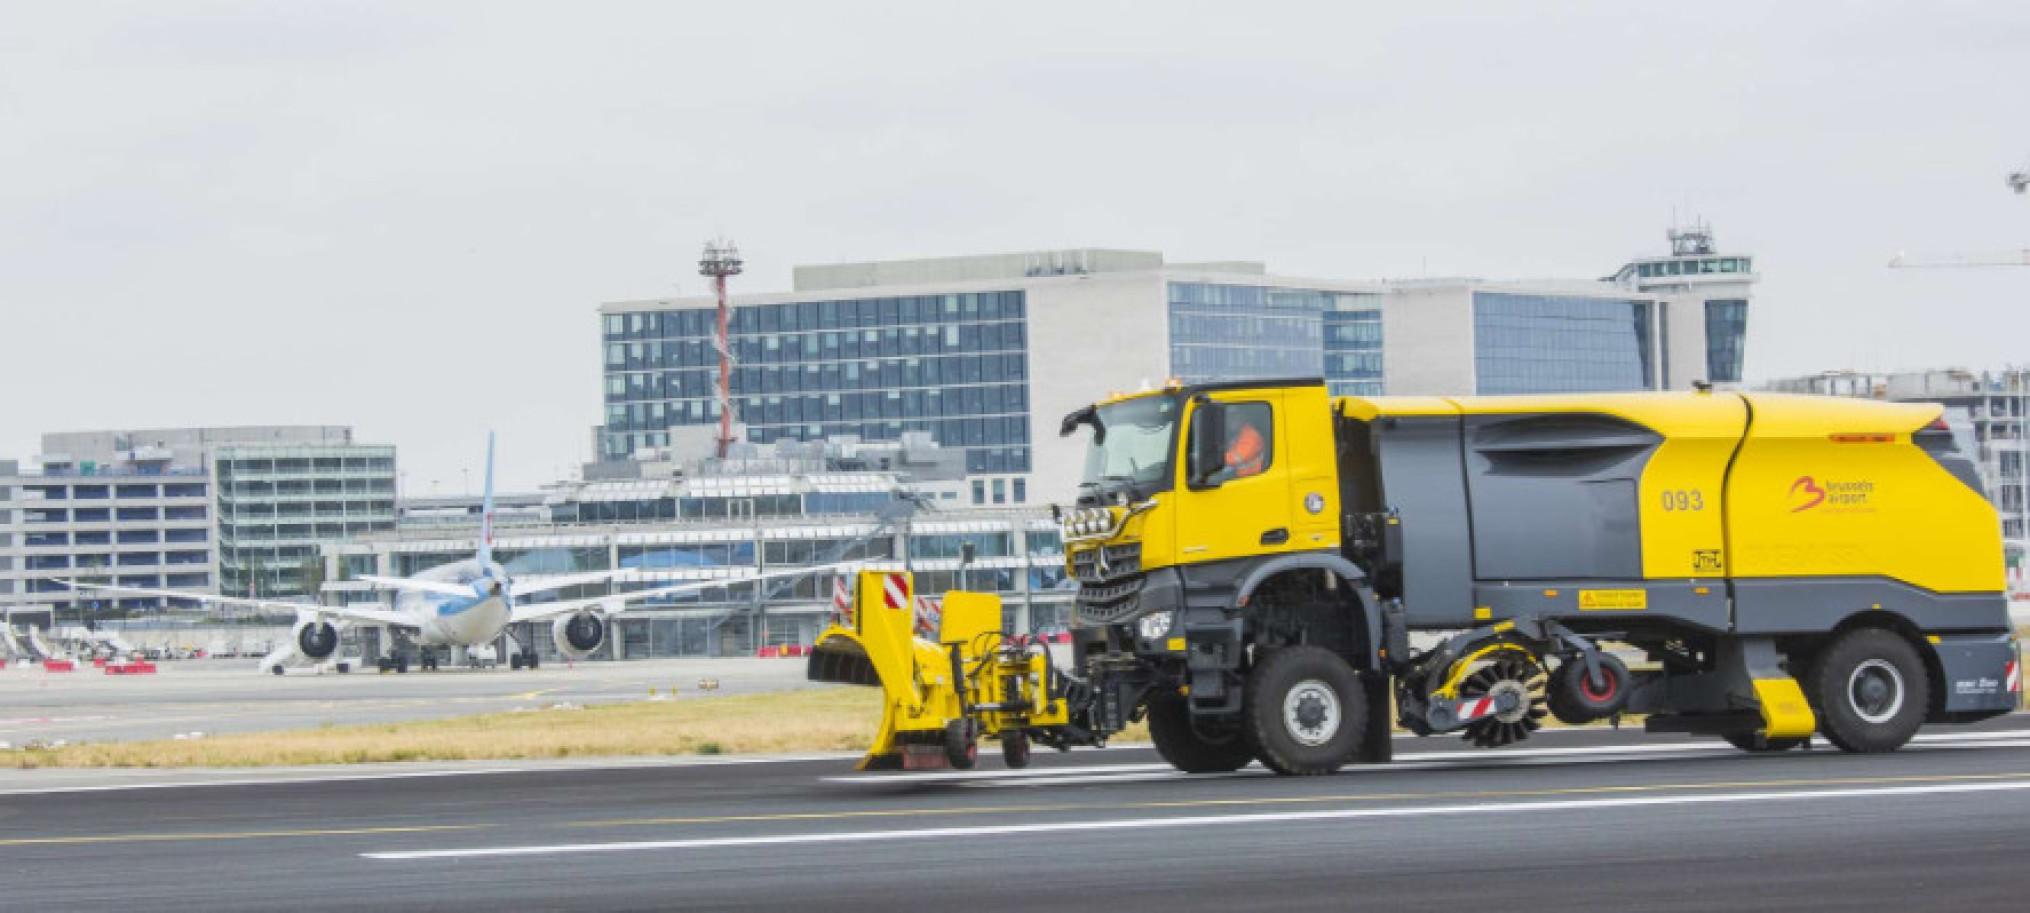 winterstrooidienst luchthaven_Hectares